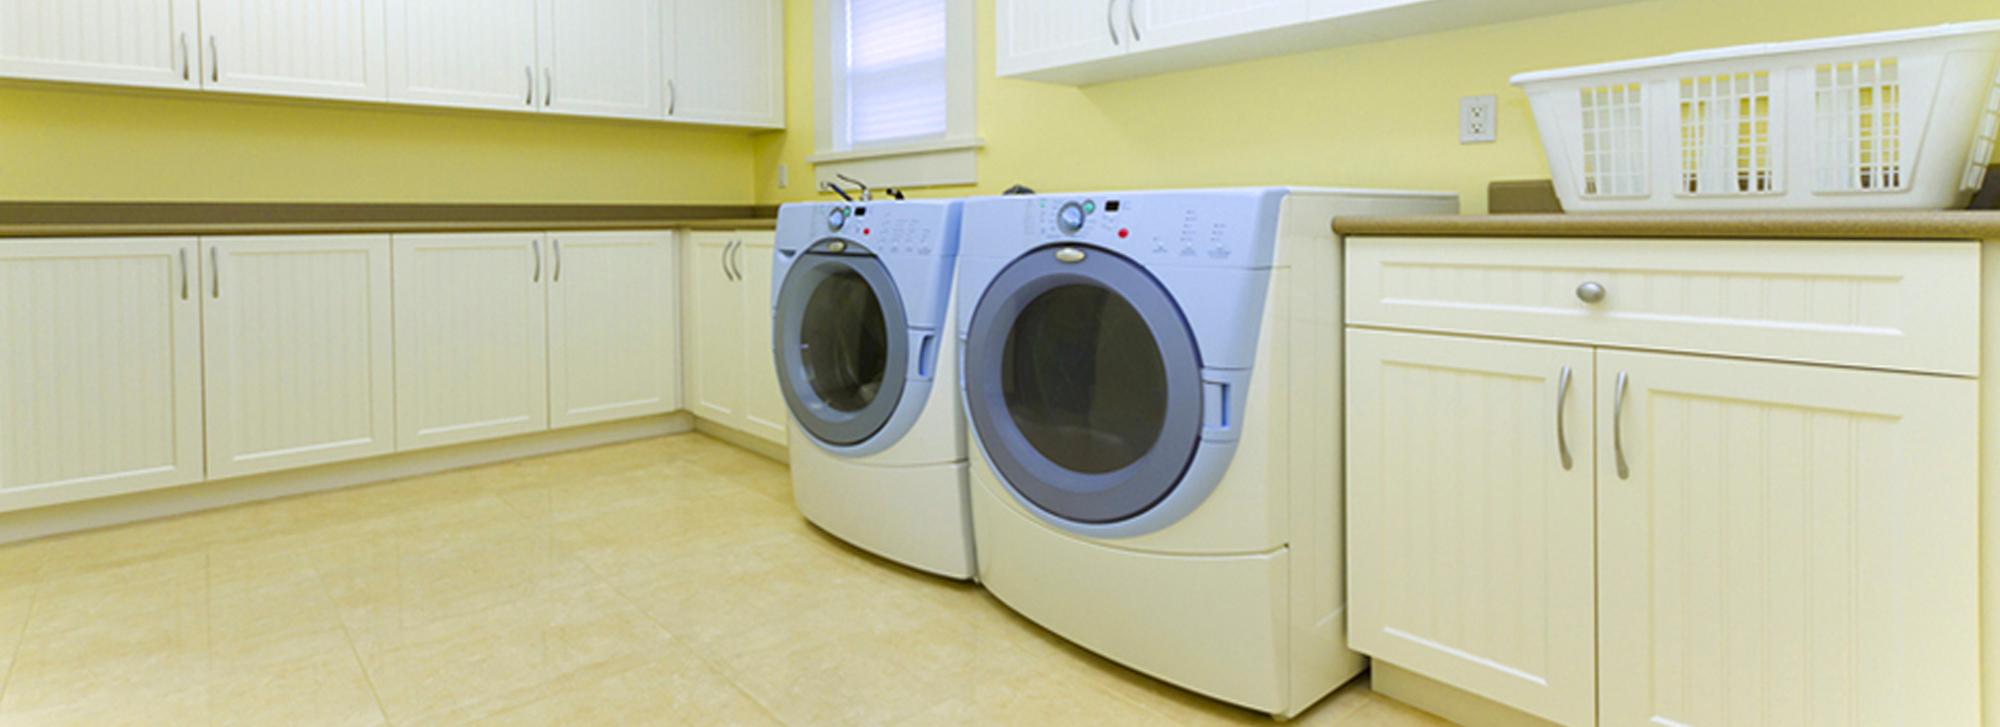 Laundry Renovations